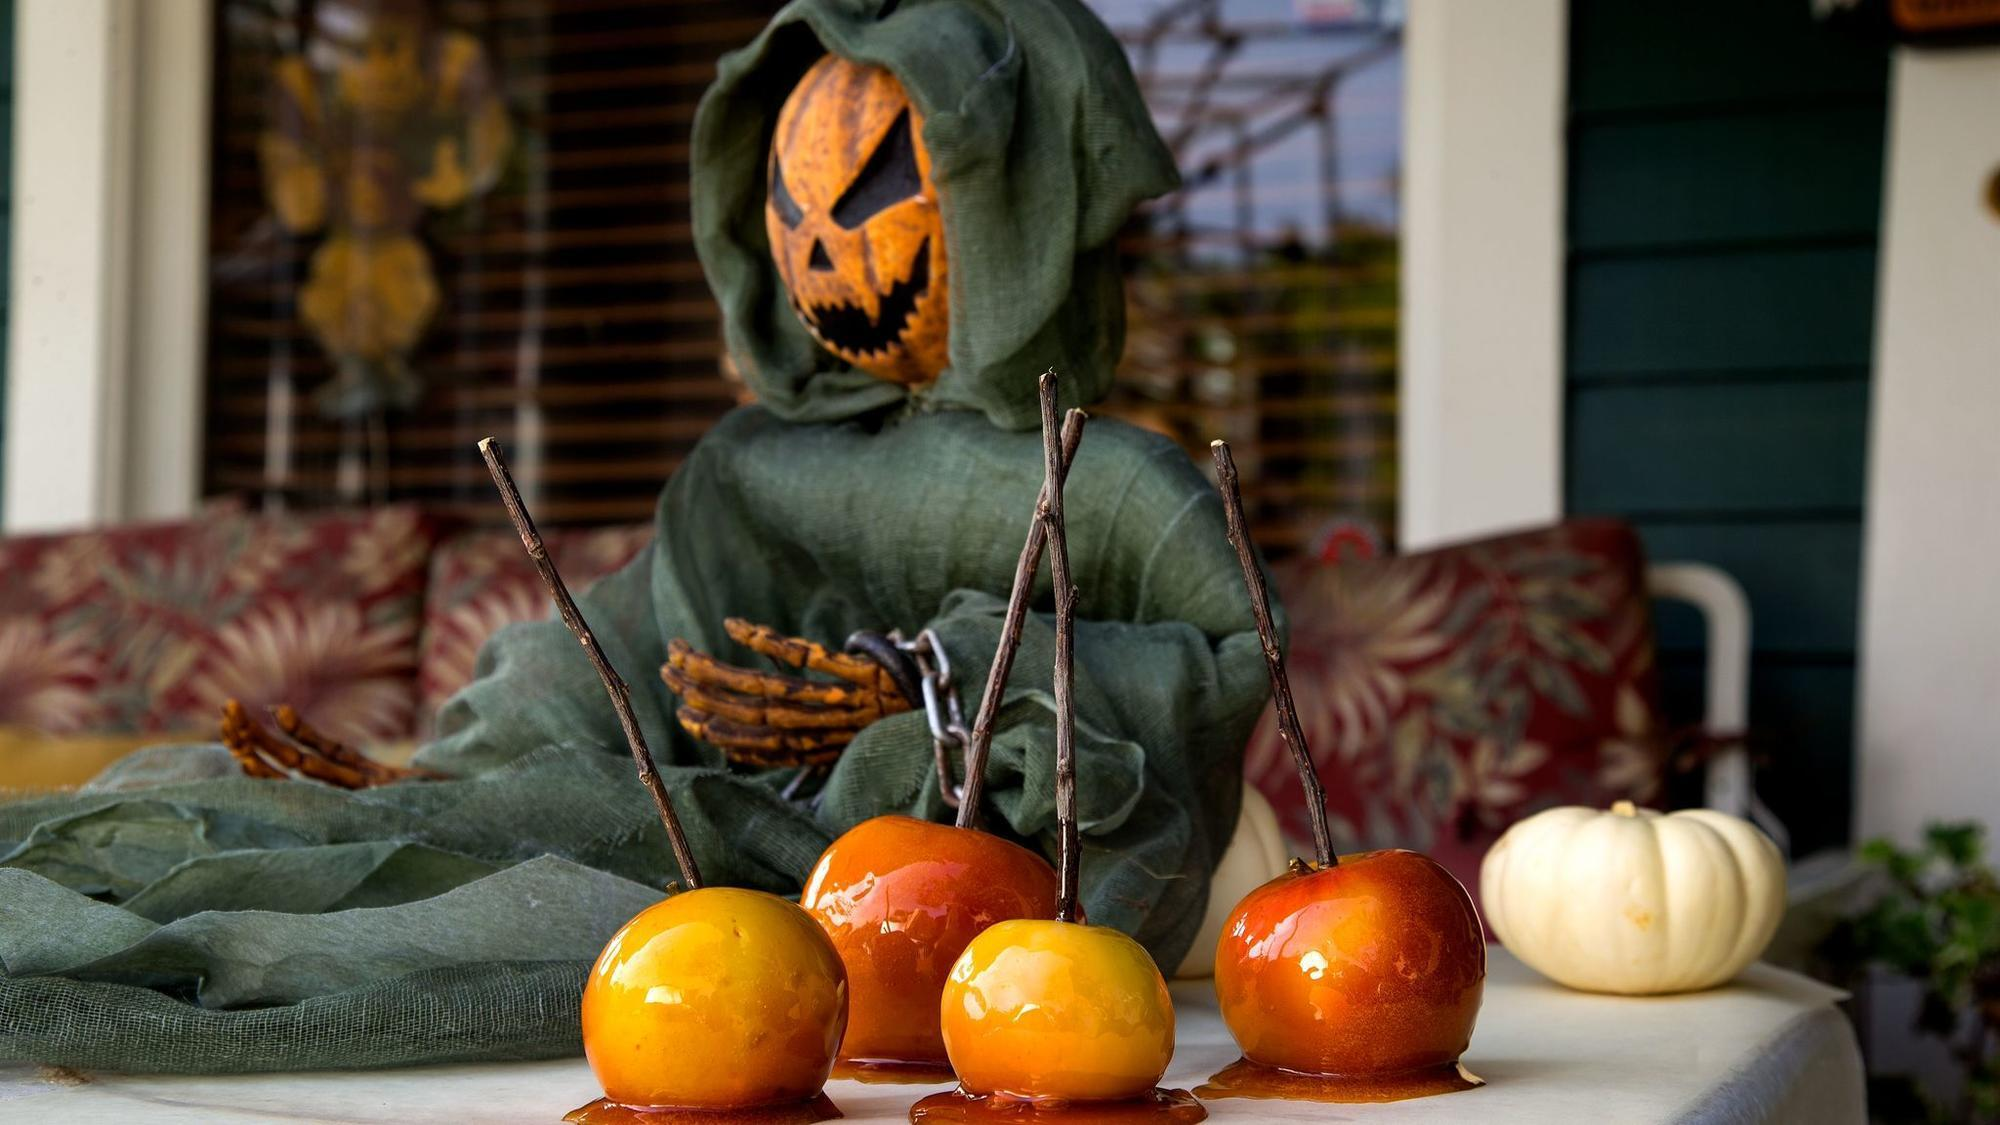 toffee apples on Halloween